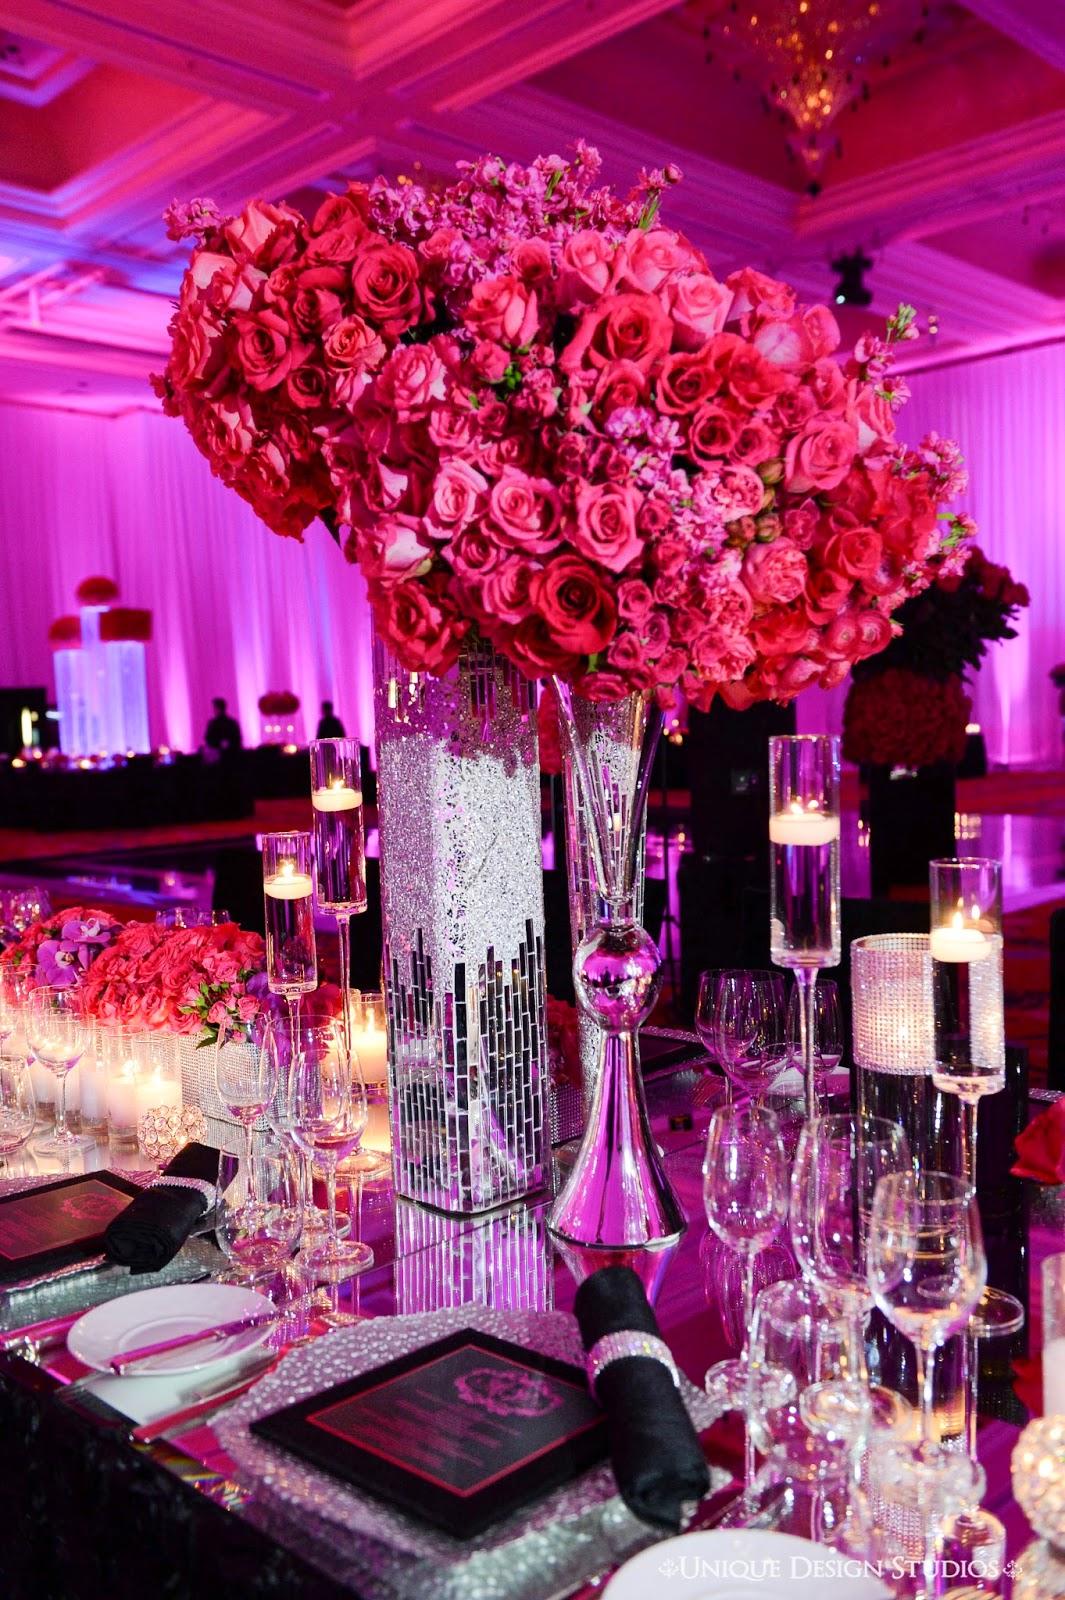 tiffany cook events omg las vegas wedding reception